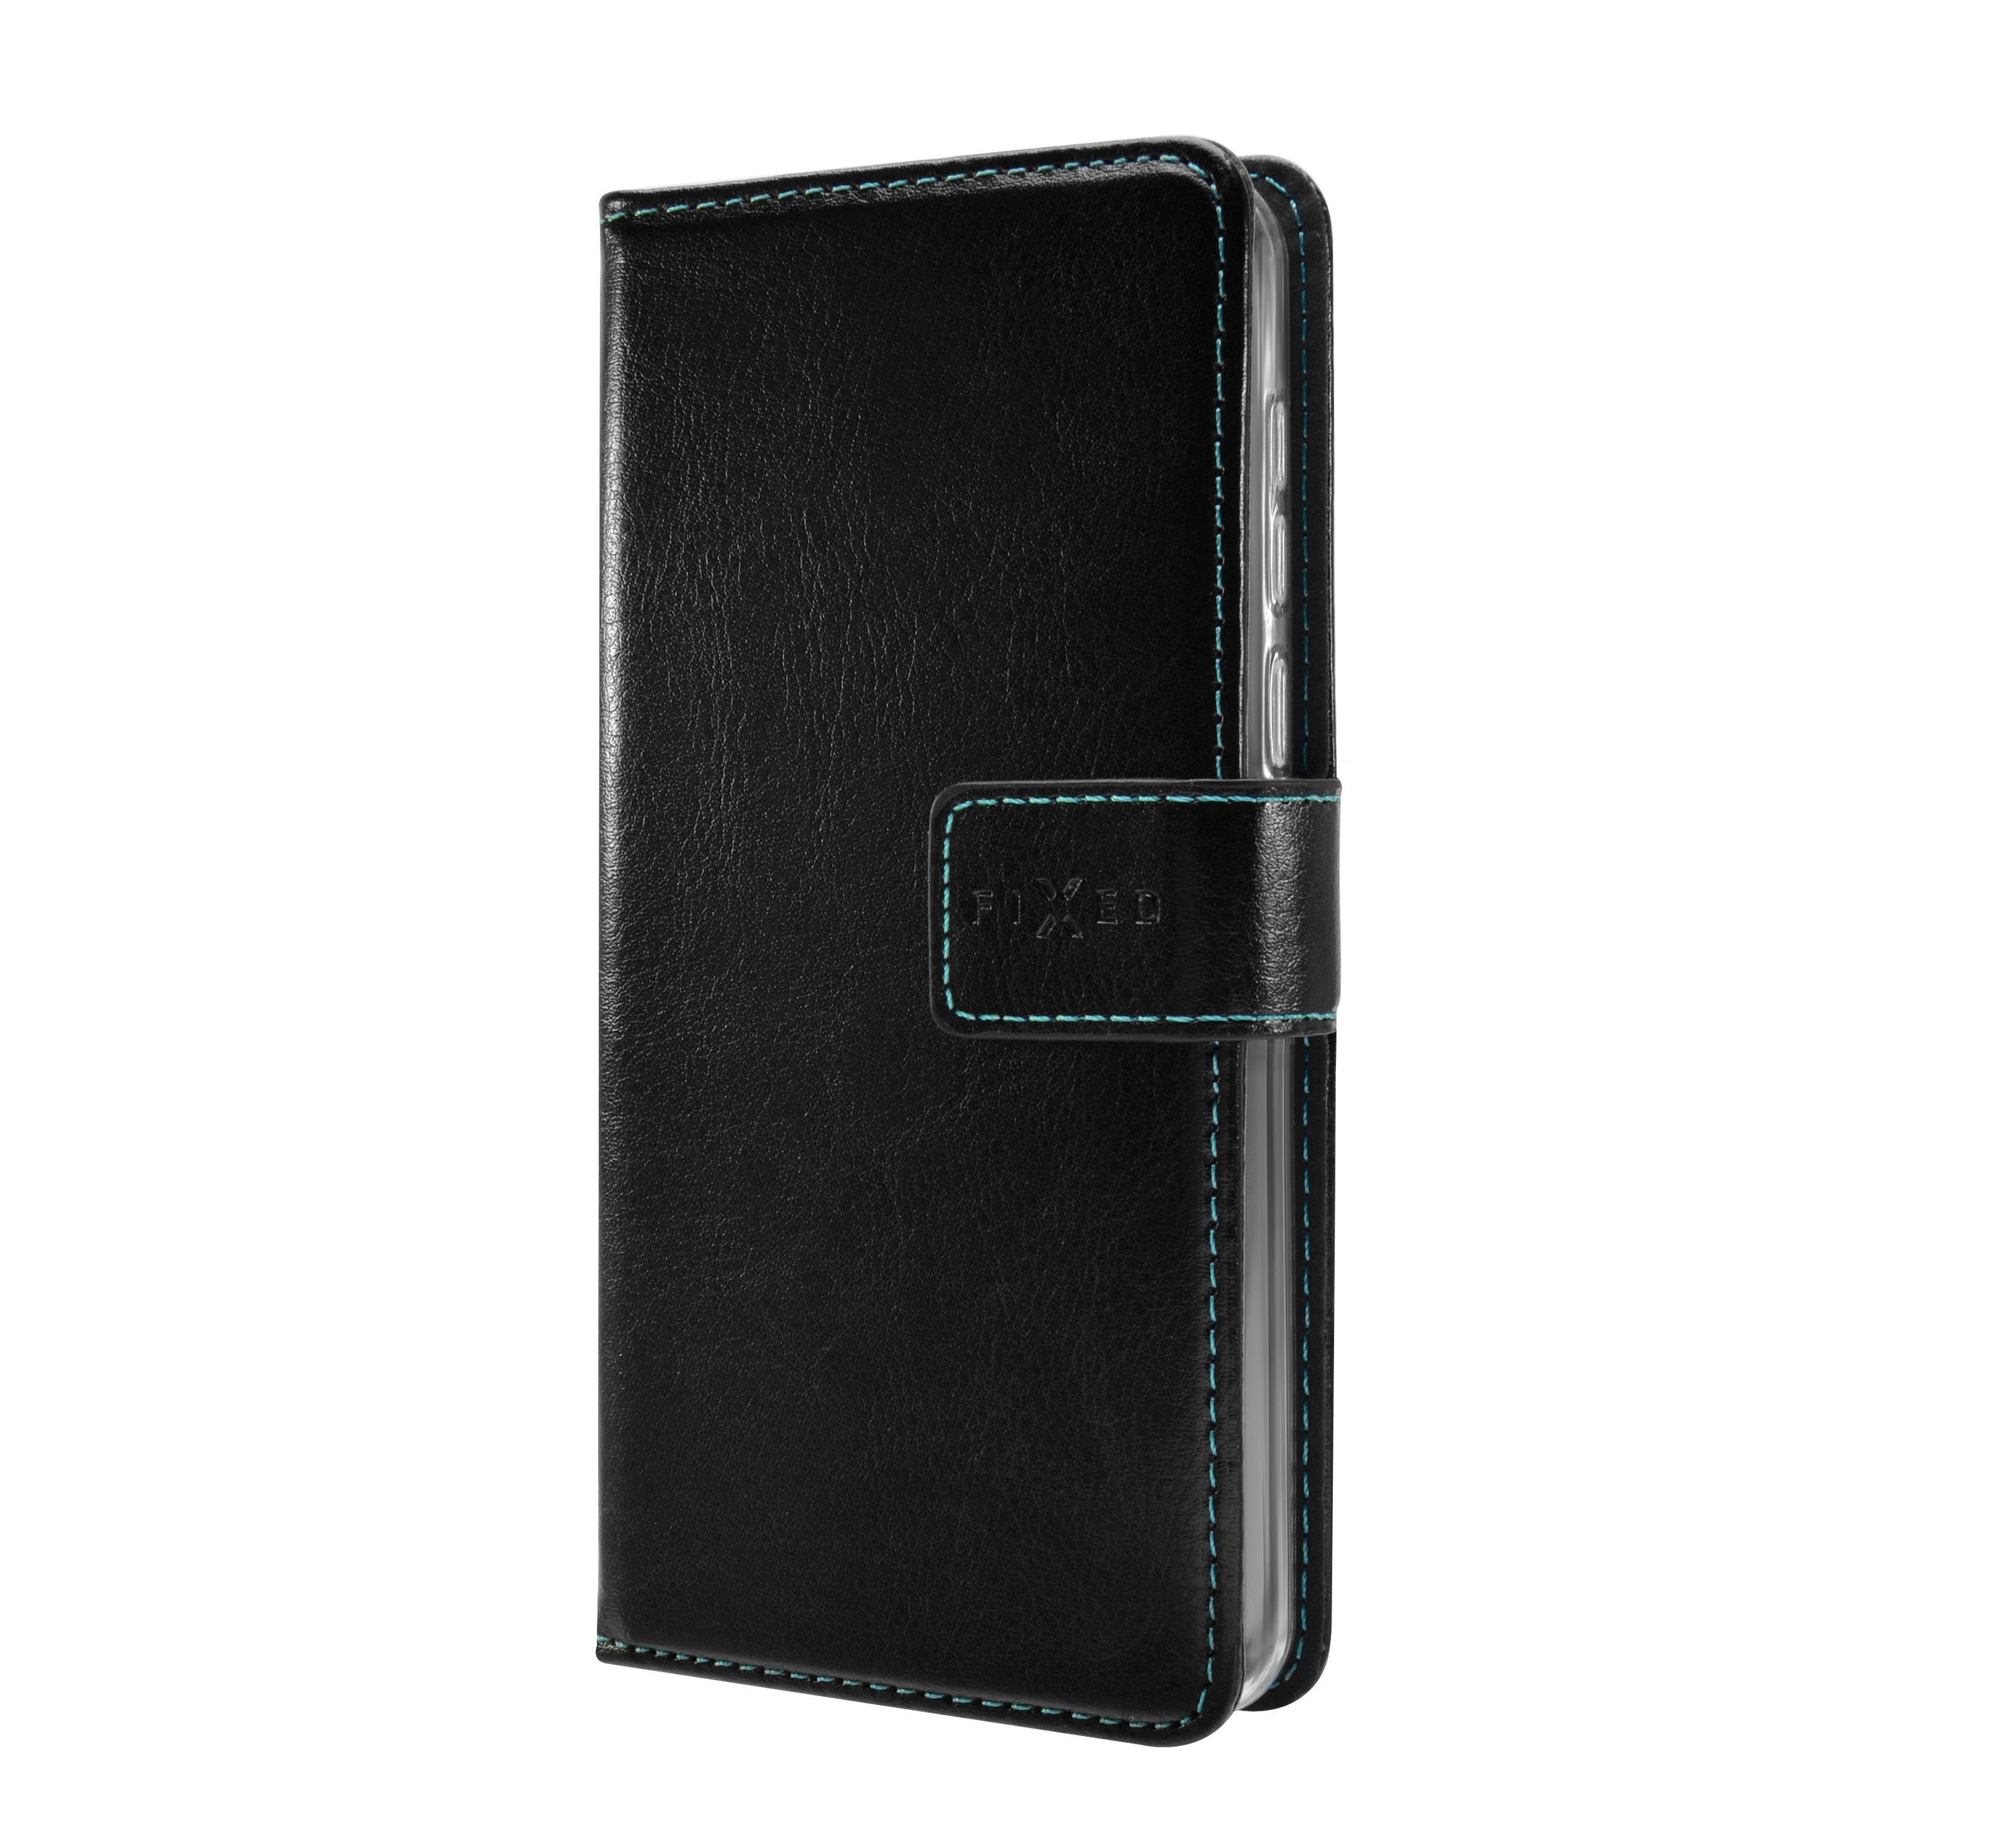 FIXED Opus flipové pouzdro pro Samsung Galaxy J4 Plus, černé